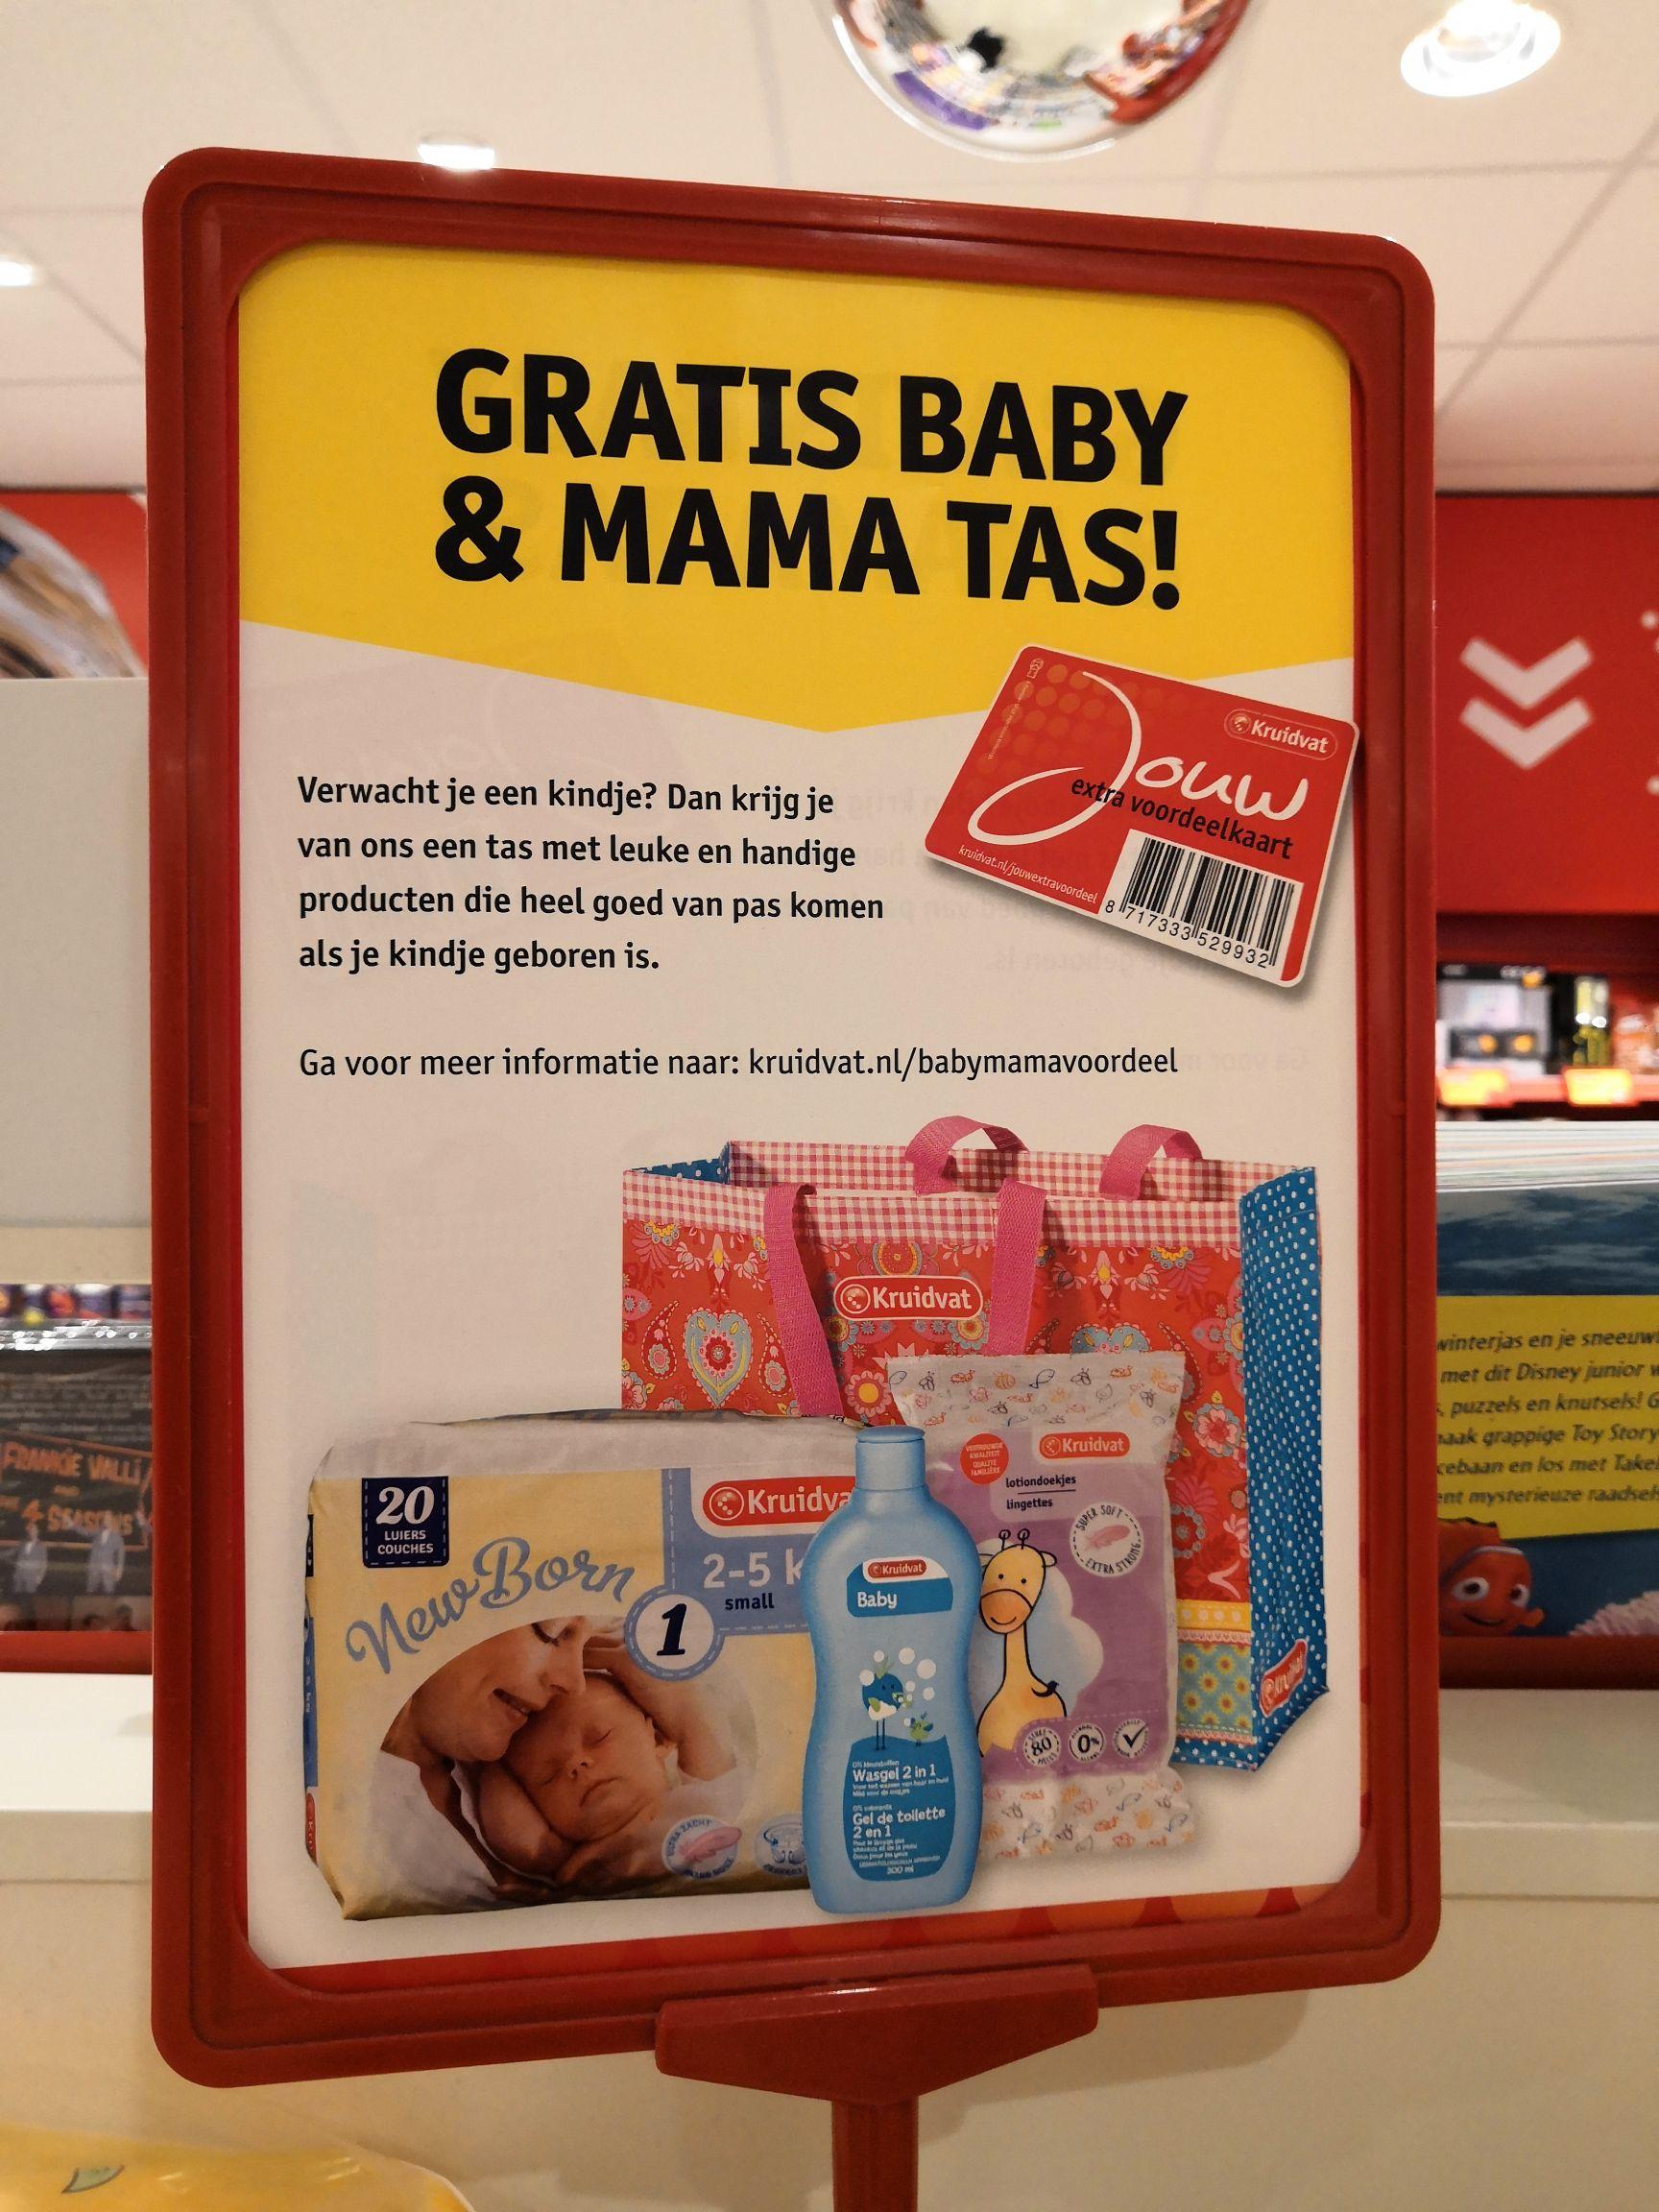 Gratis Baby & Mama tas @Kruidvat